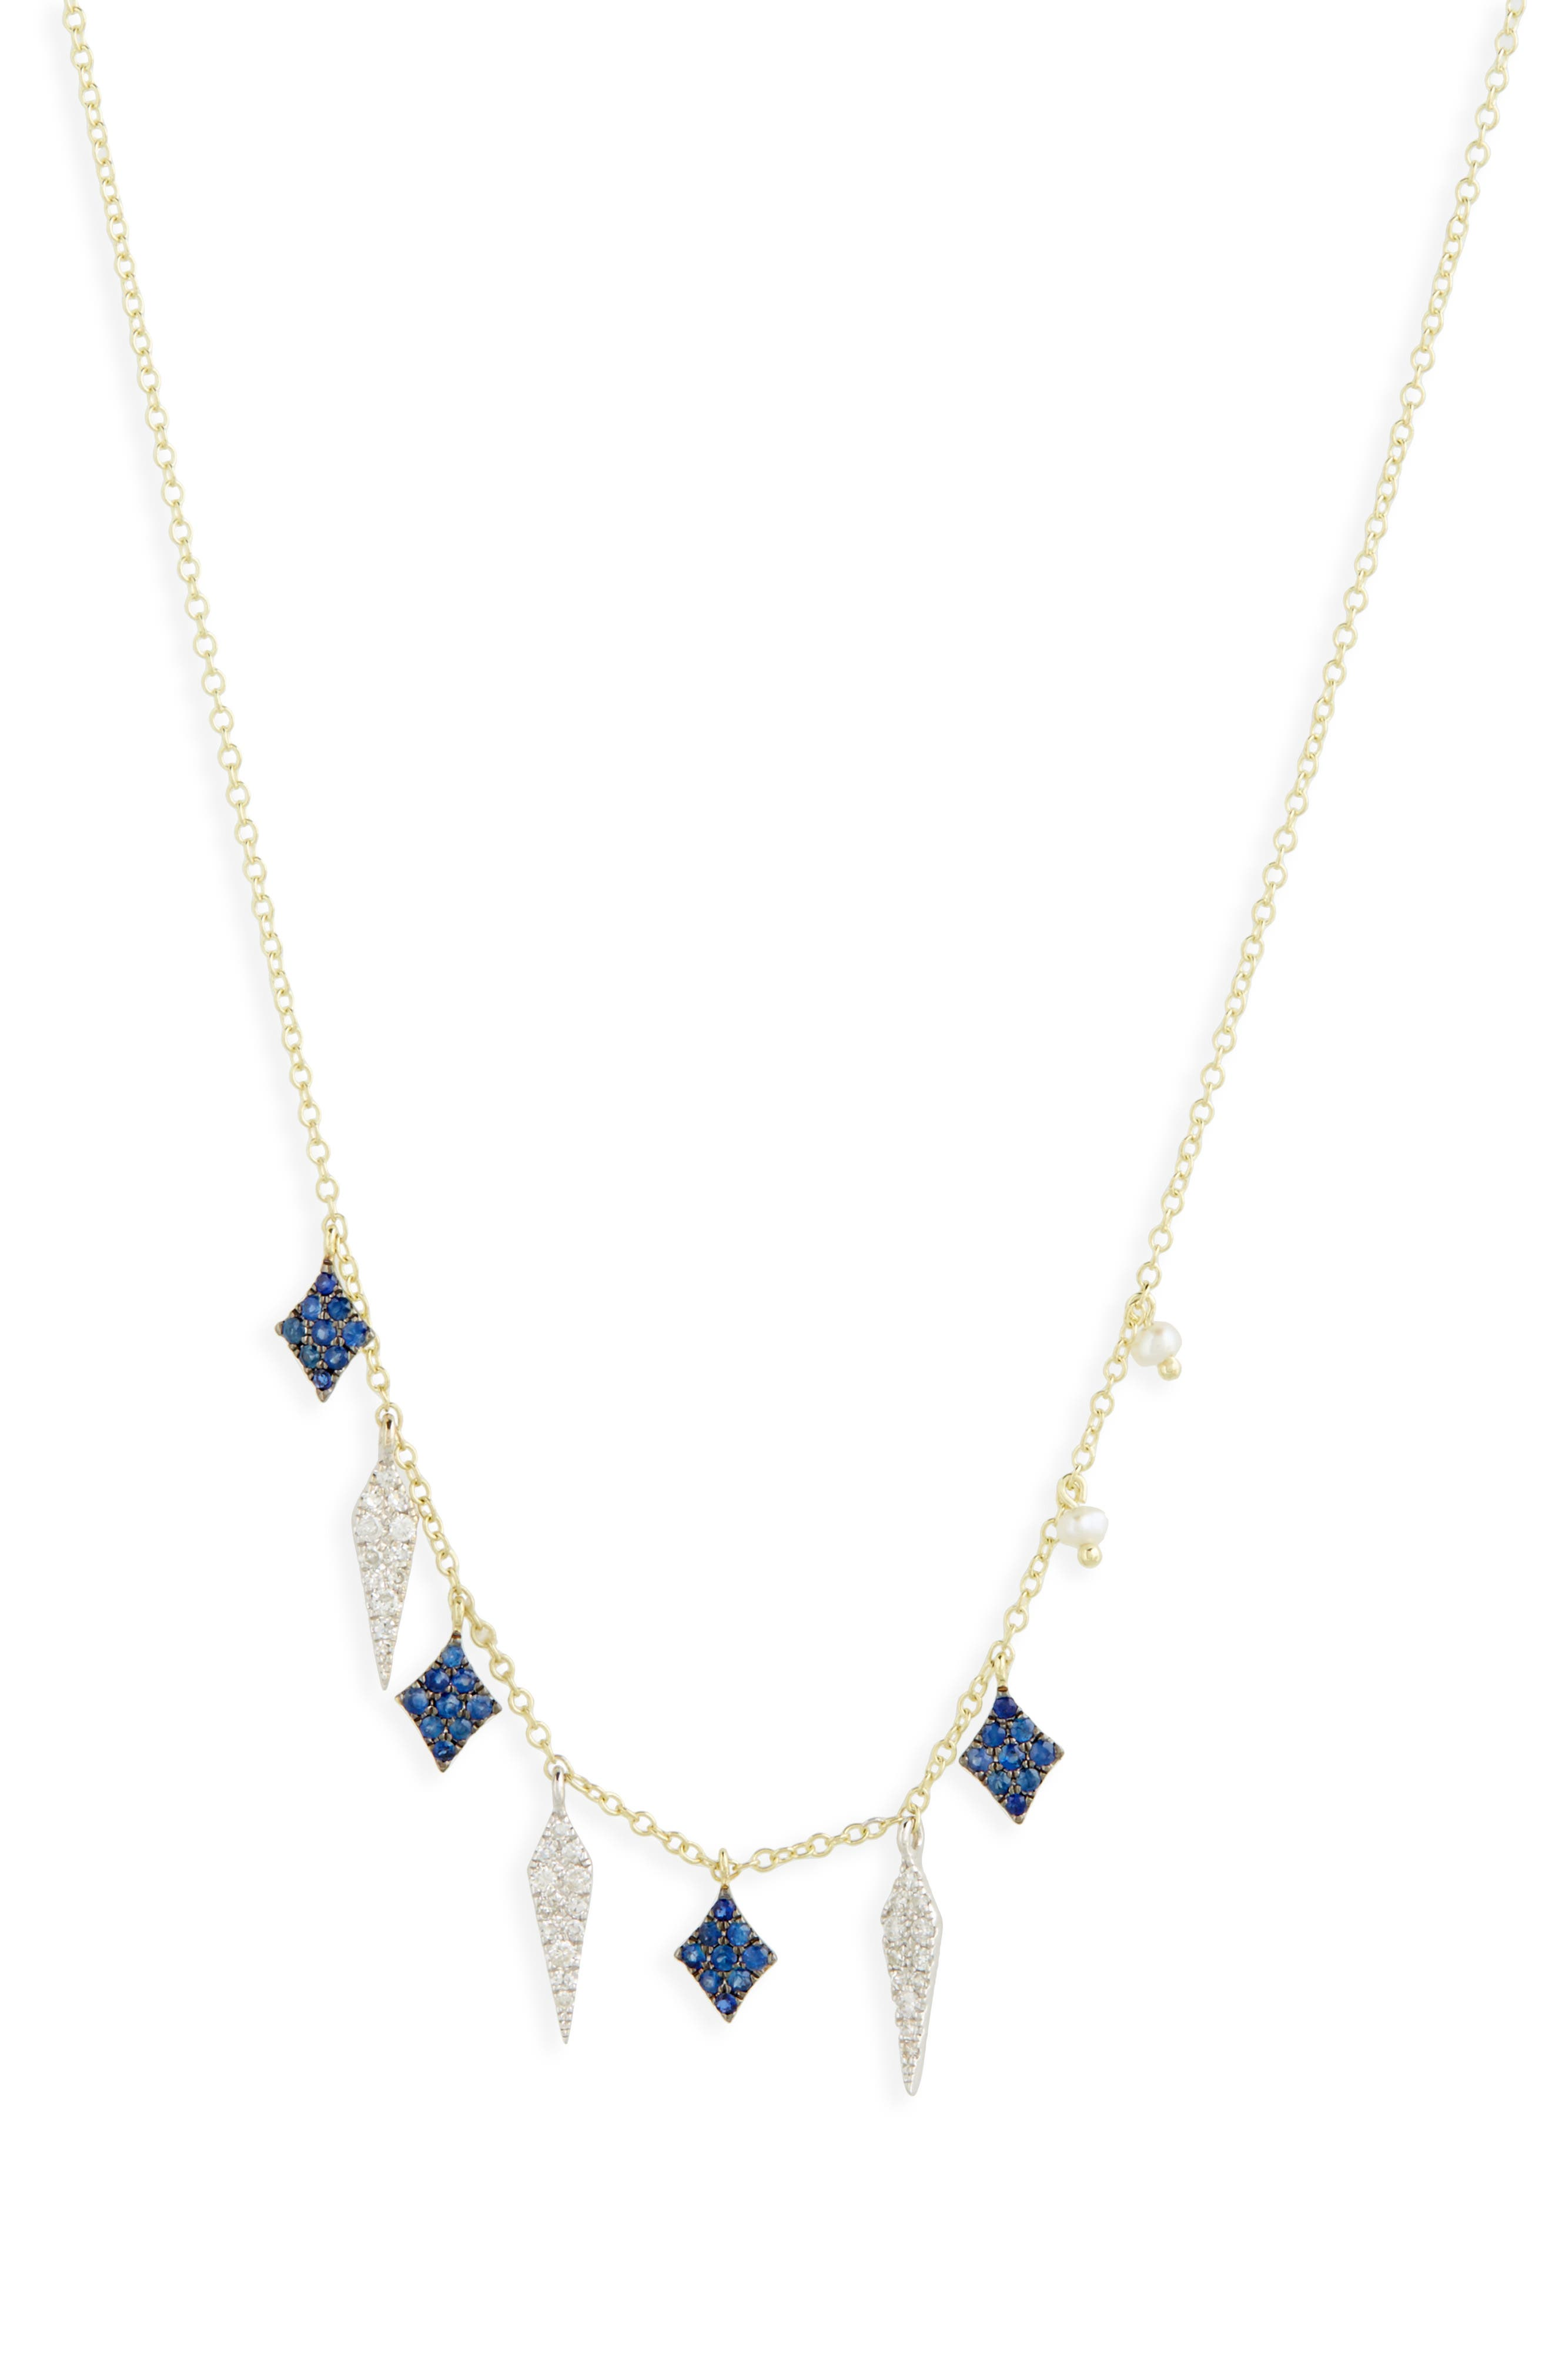 Miera T Diamond & Sapphire Charm Necklace,                             Main thumbnail 1, color,                             710